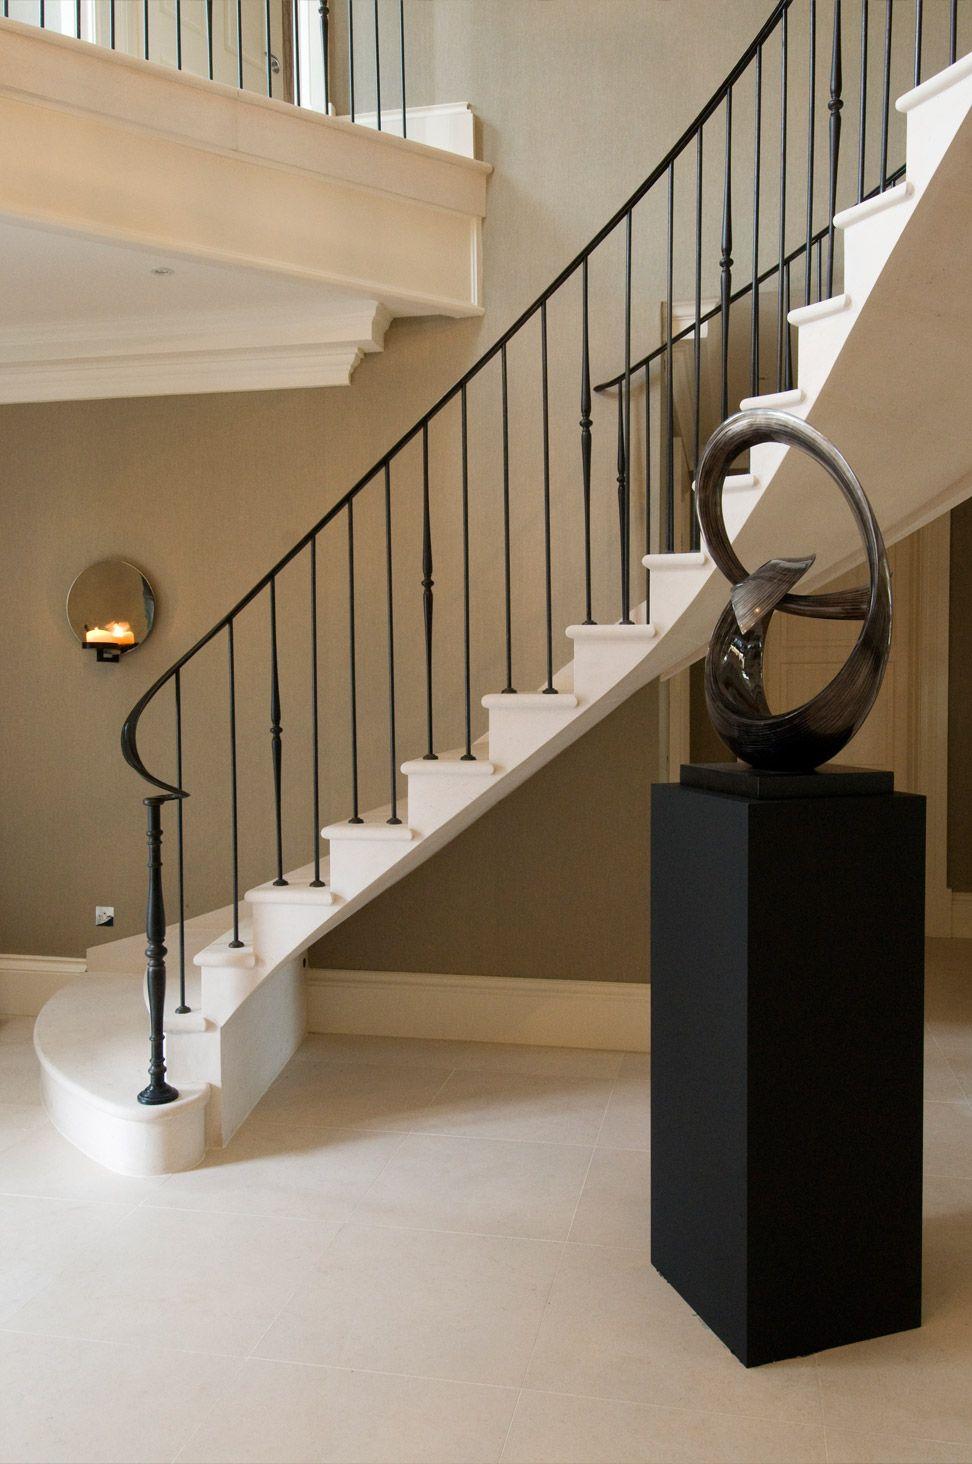 19 moleanos stone cantilever stair with elegant metal. Black Bedroom Furniture Sets. Home Design Ideas